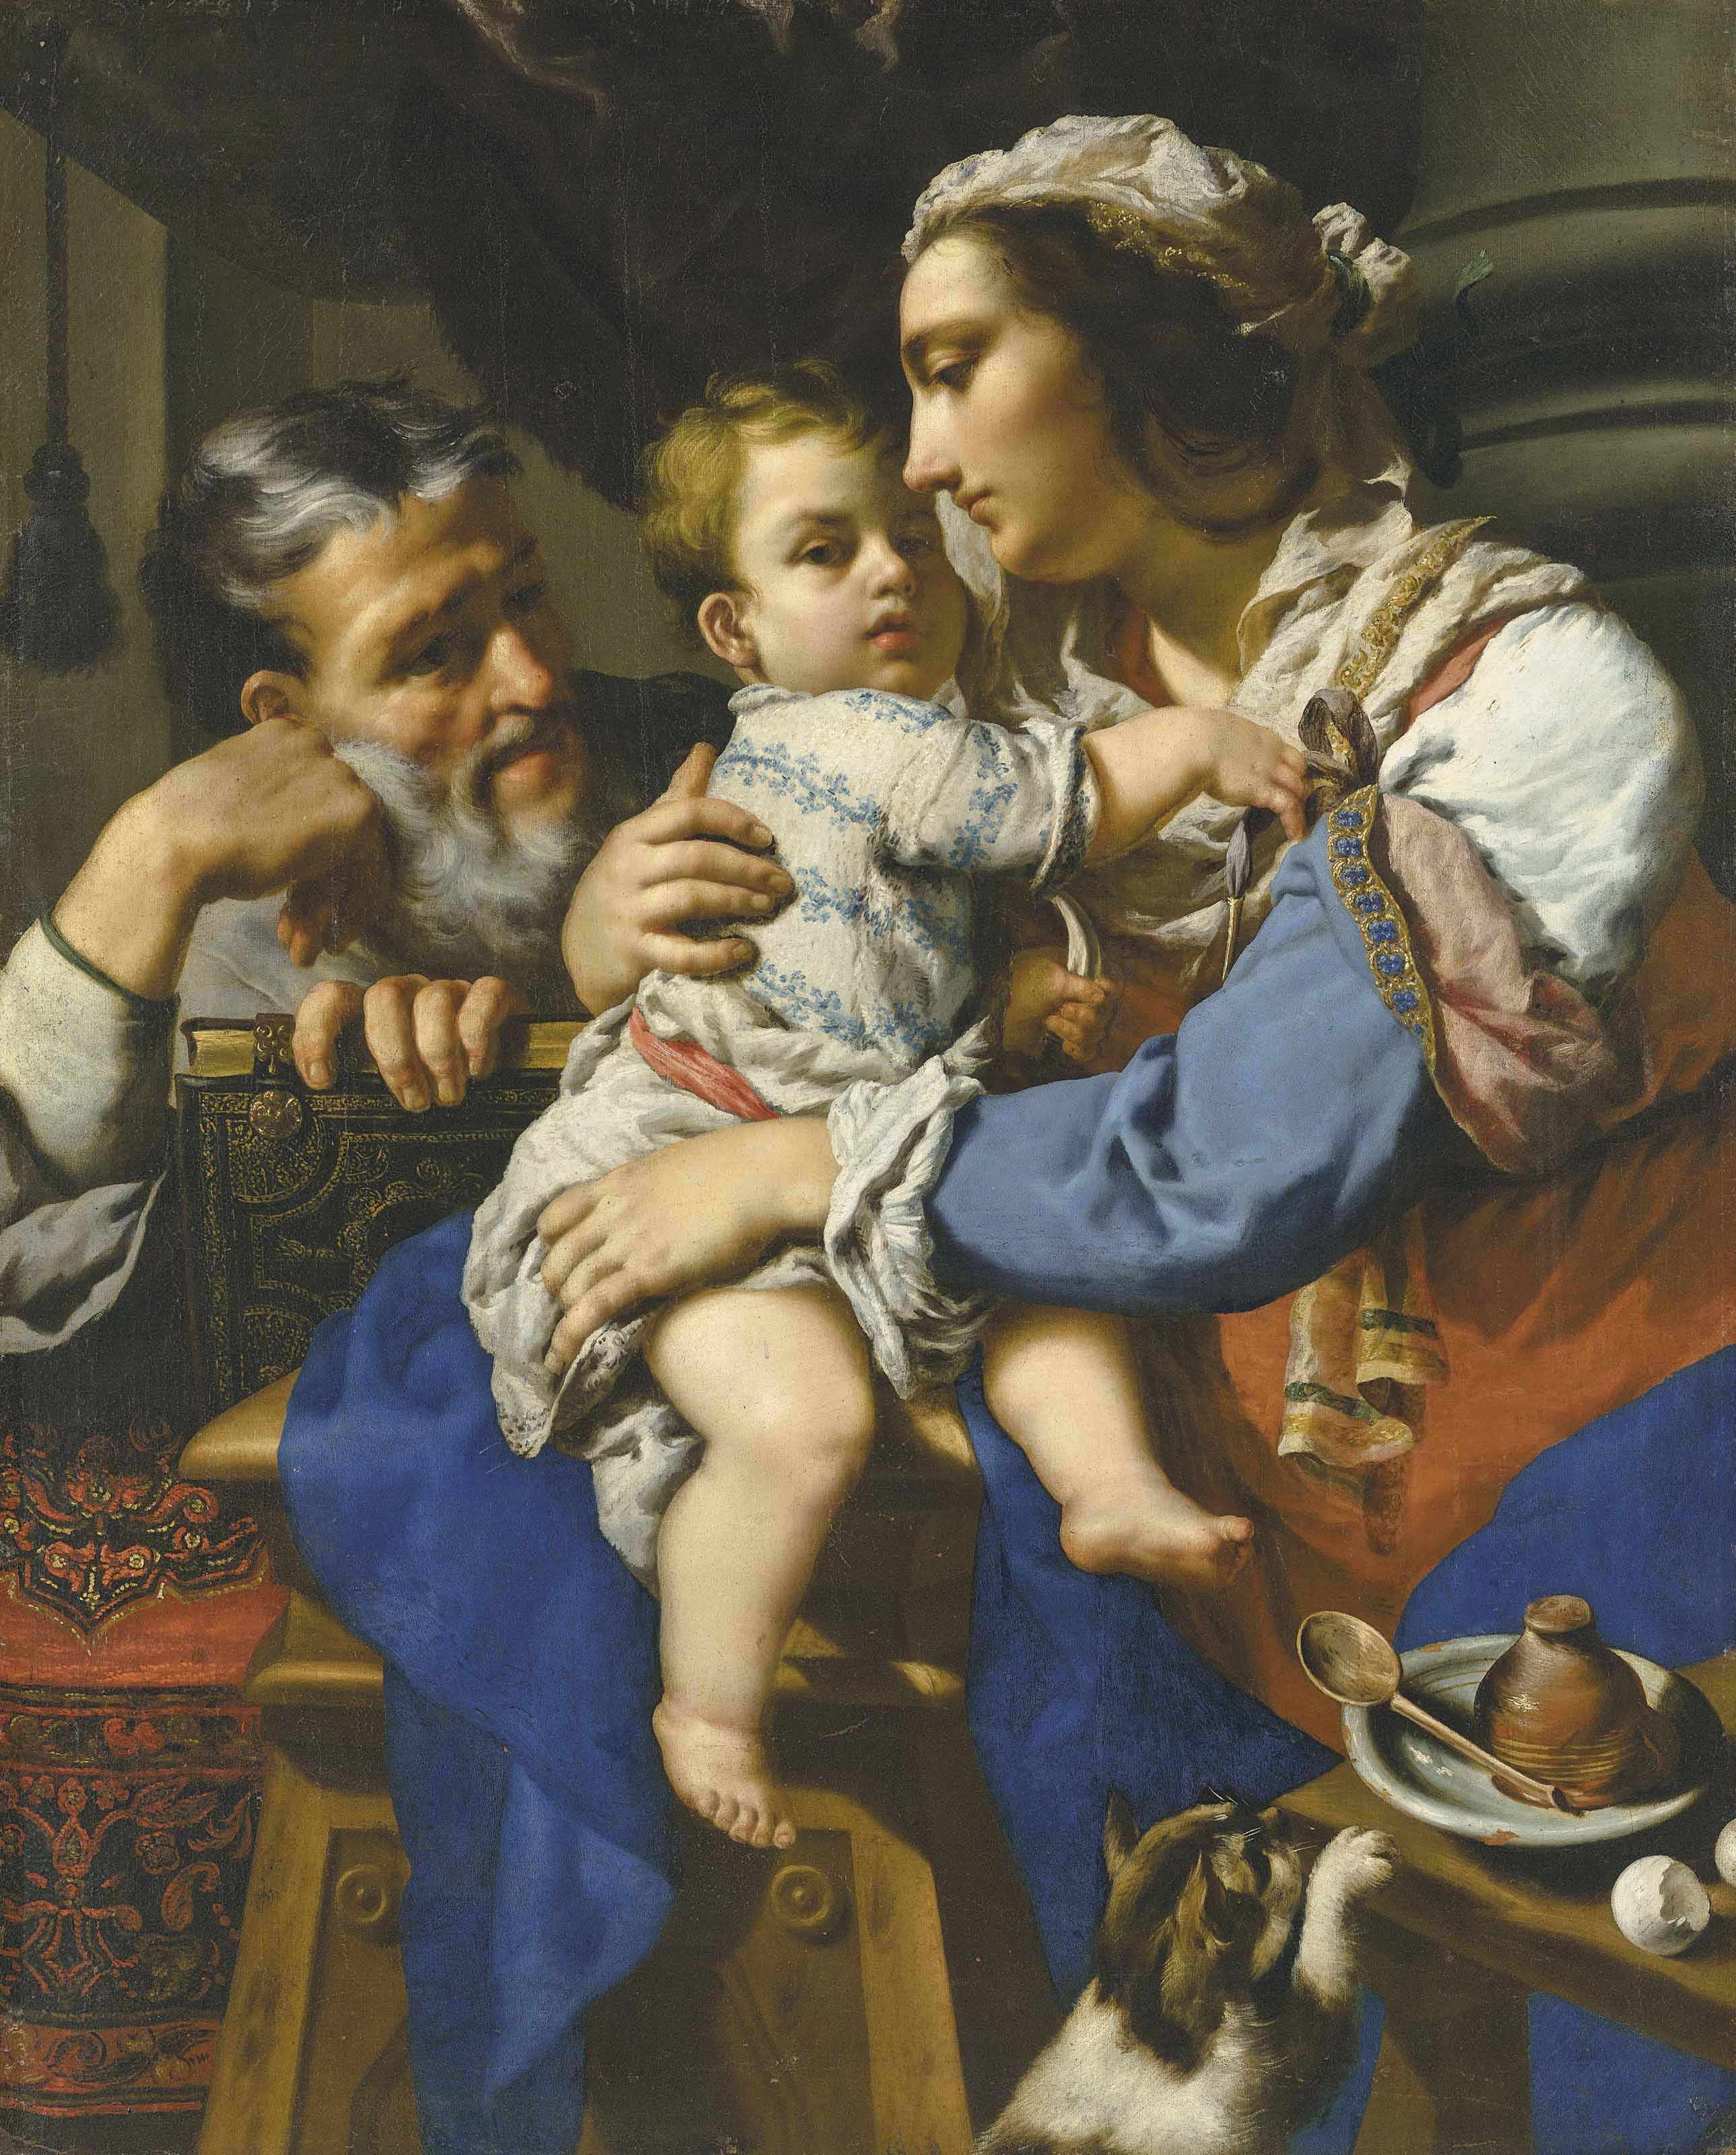 Alessandro Rosi (Florence c. 1627- c. 1707)